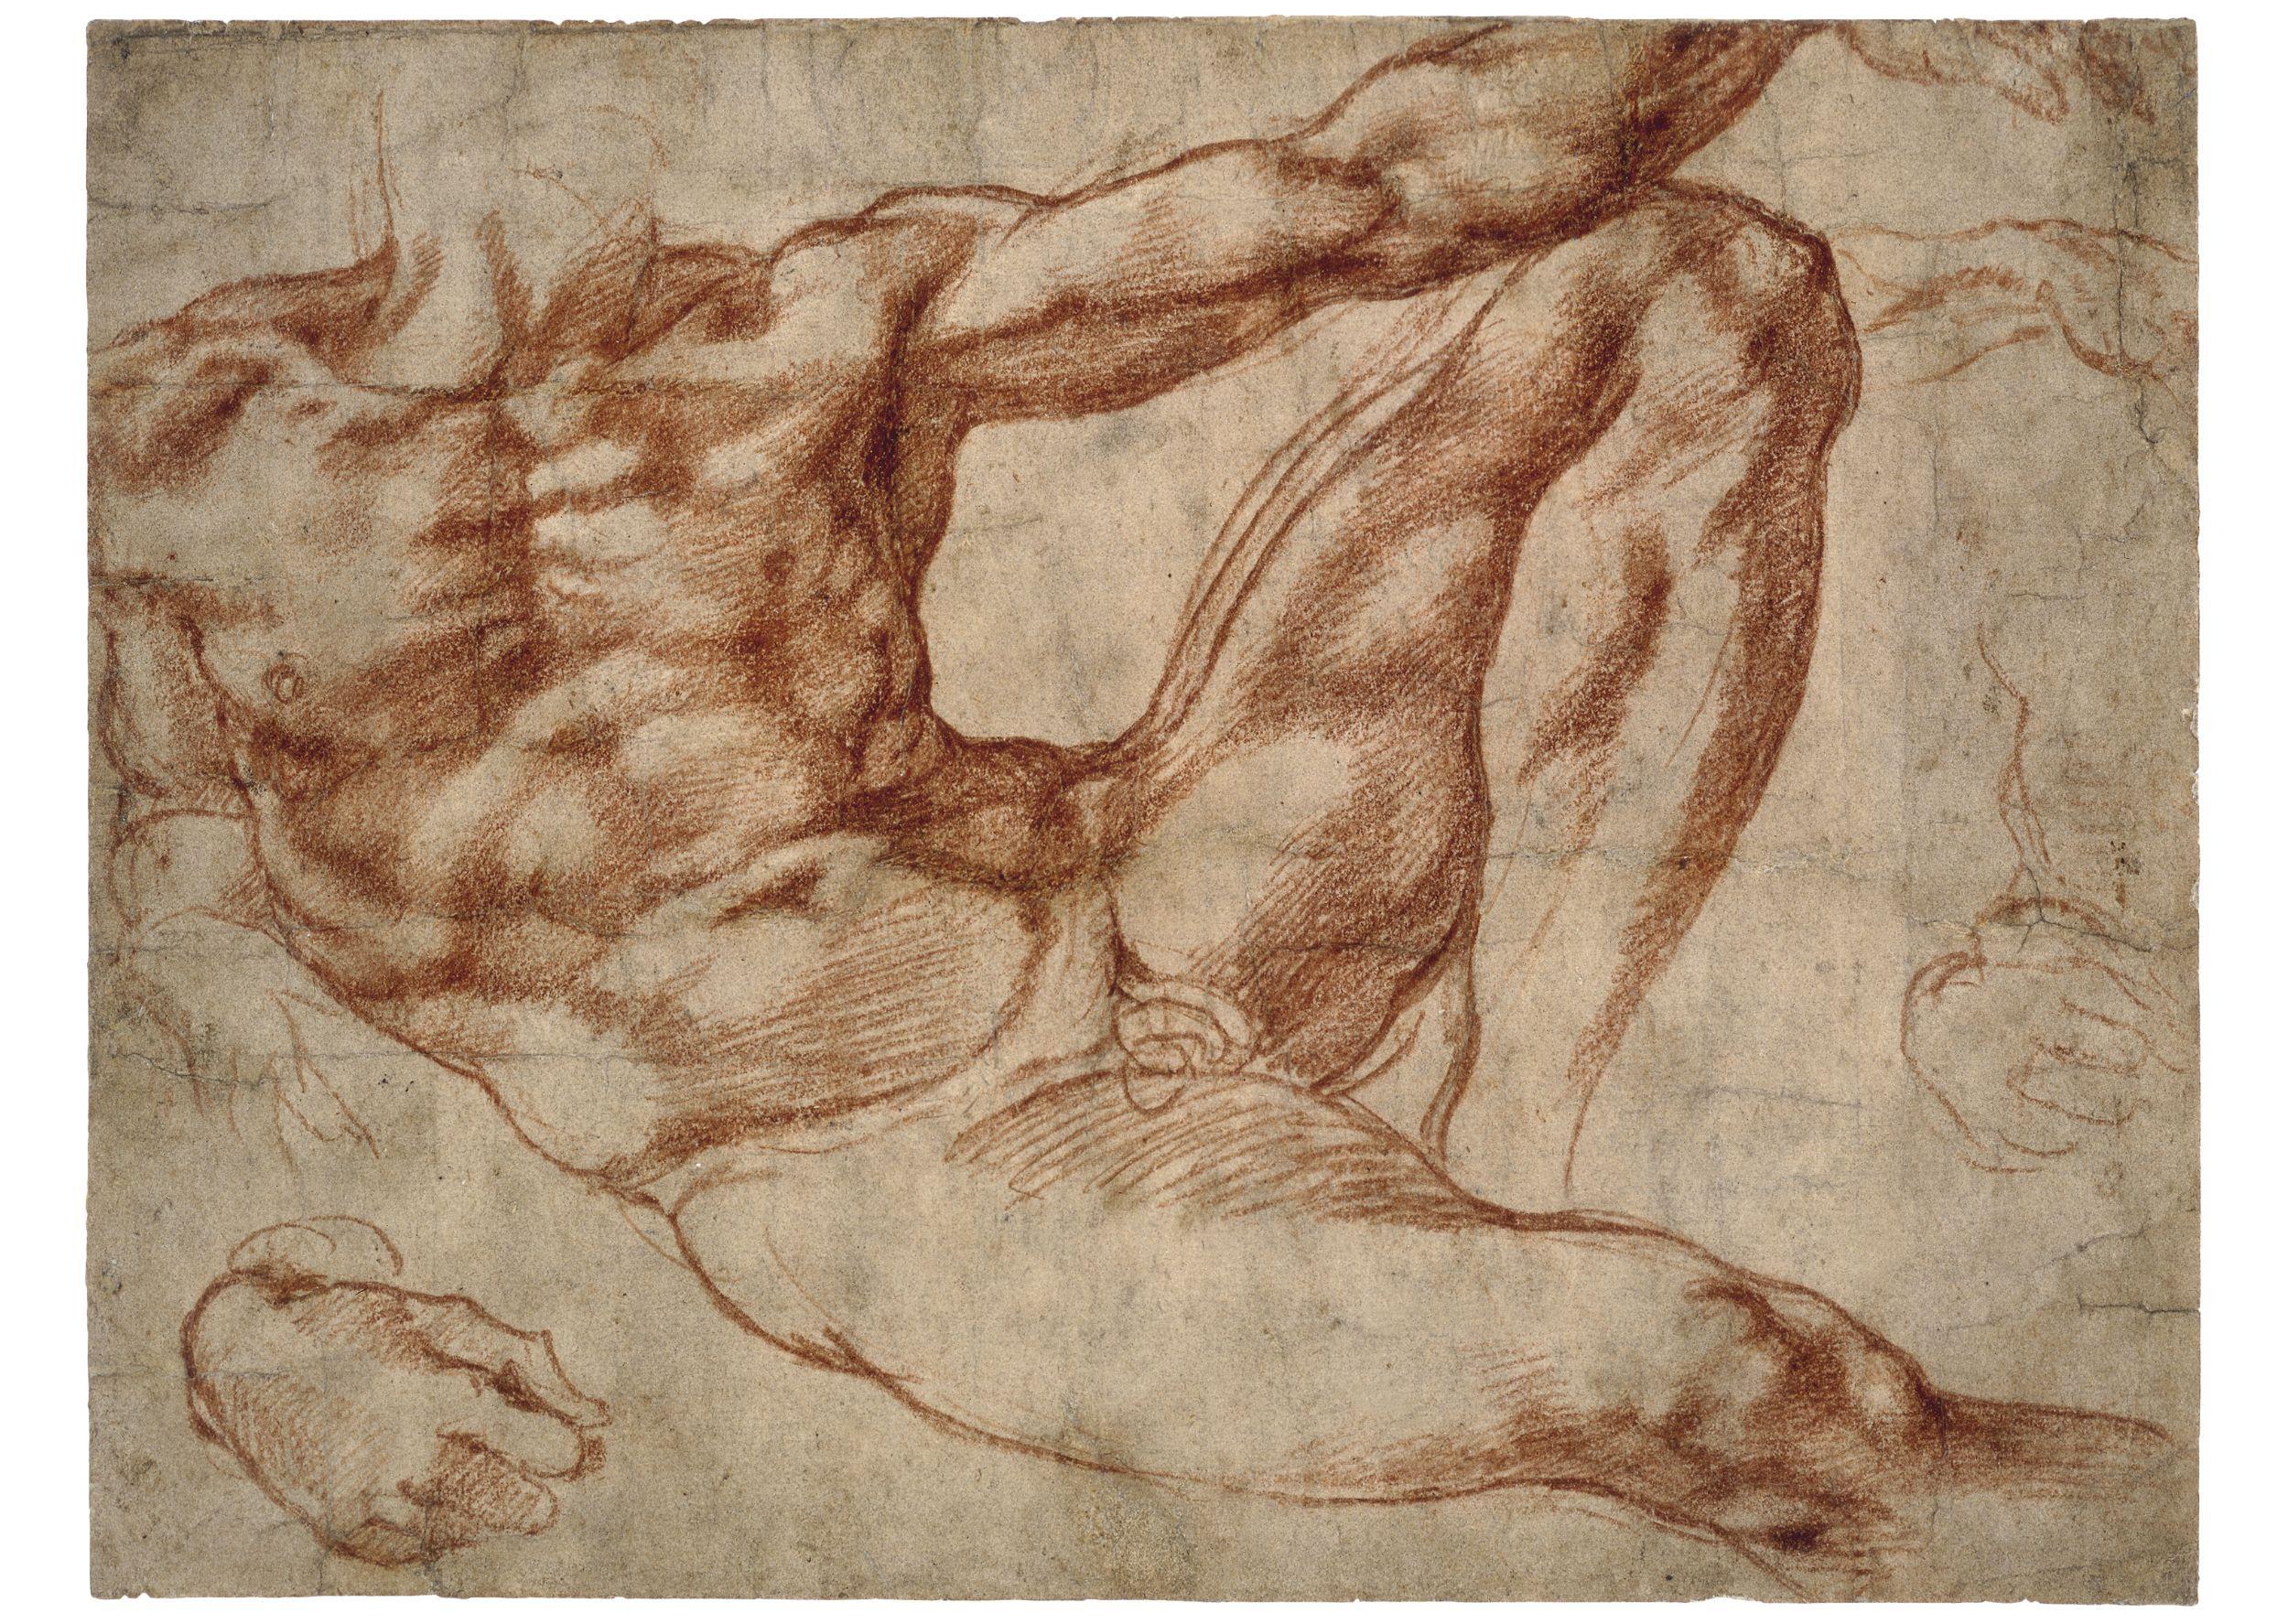 Michelangelo Drawings, Michelangelo Sketches | Michelangelo Gallery